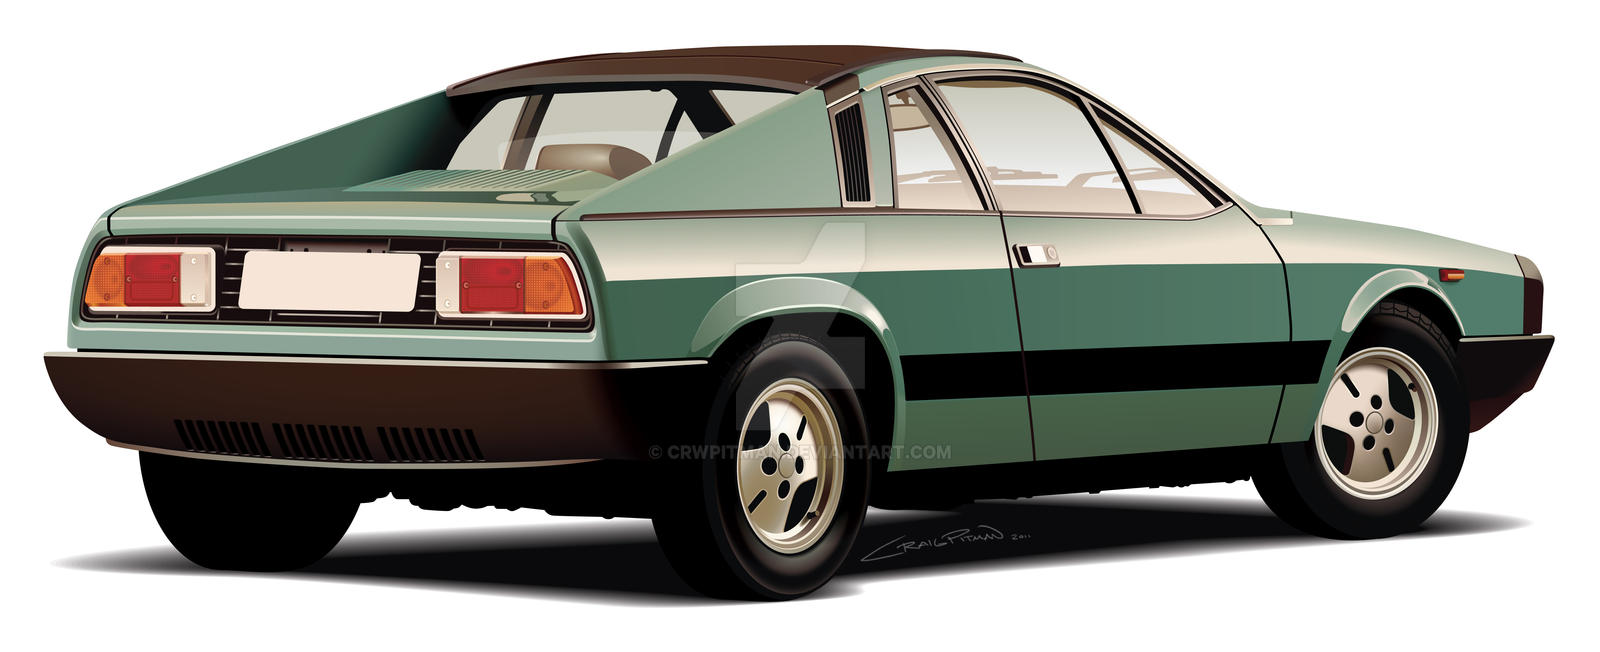 Lancia Beta Monte Carlo By Crwpitman On Deviantart